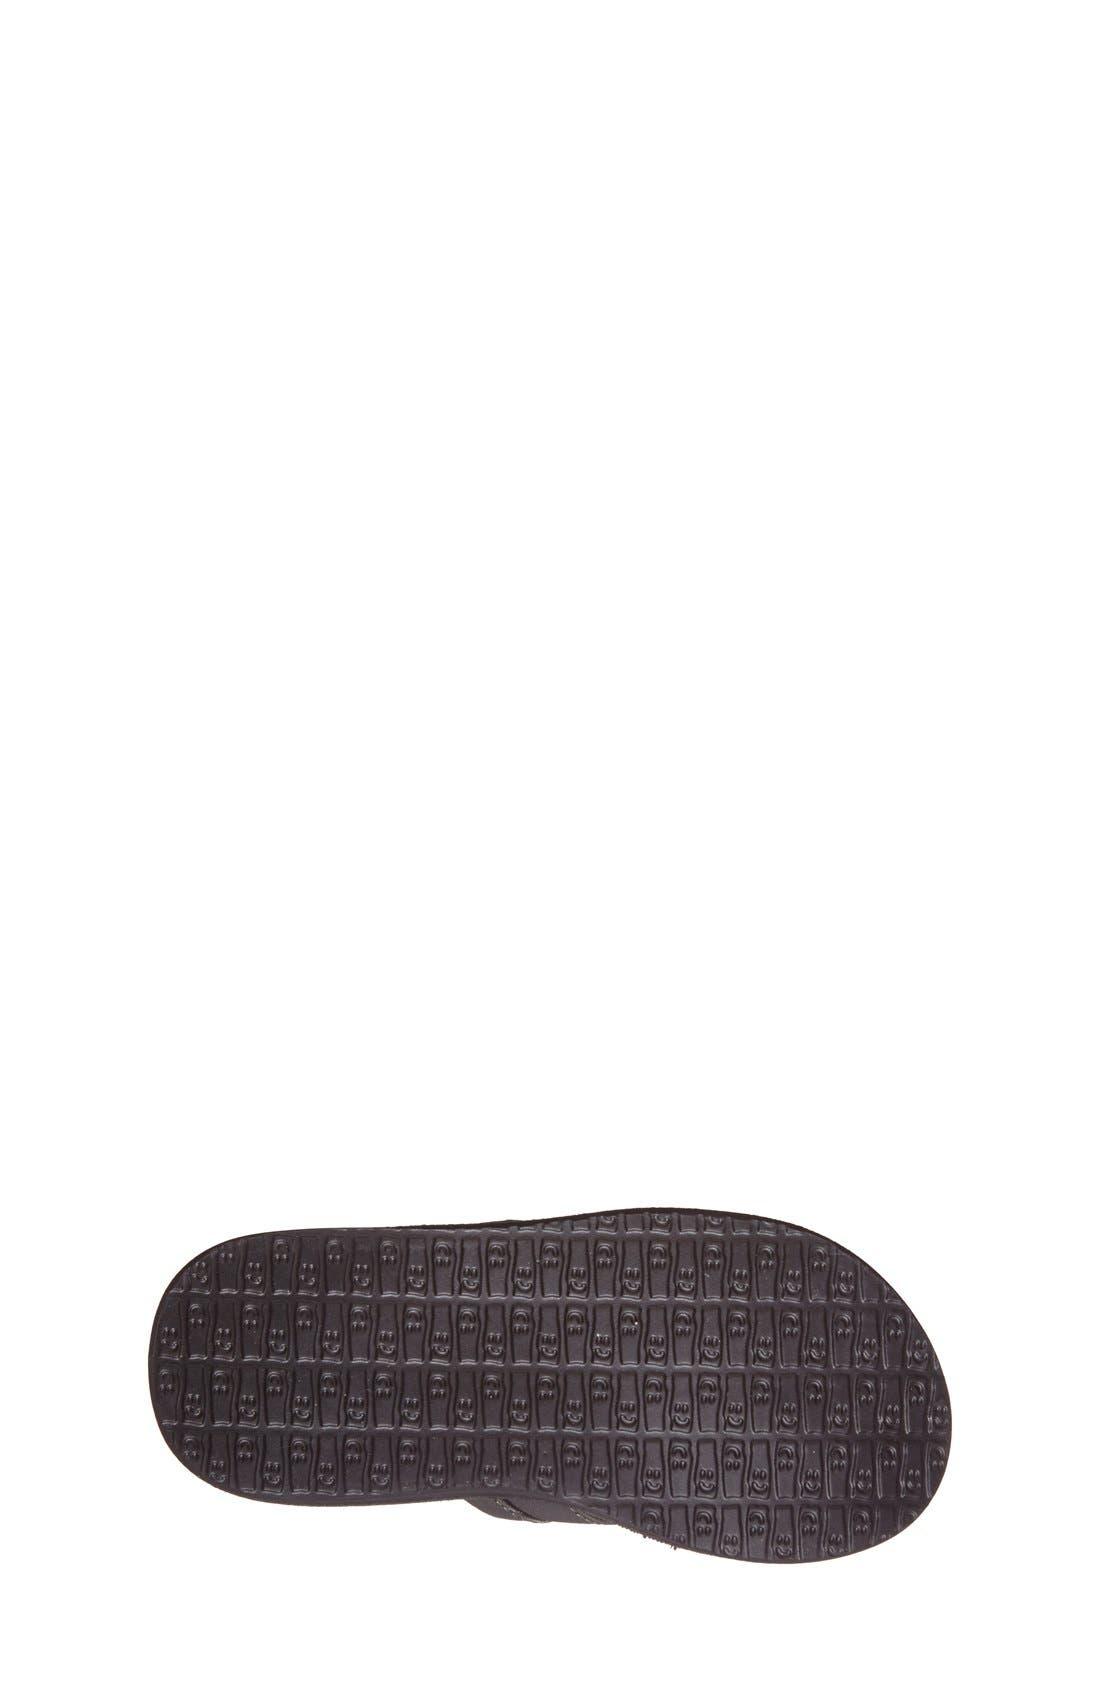 'Rootbeer Cozy' Lightweight Flip Flop Sandal,                             Alternate thumbnail 2, color,                             001